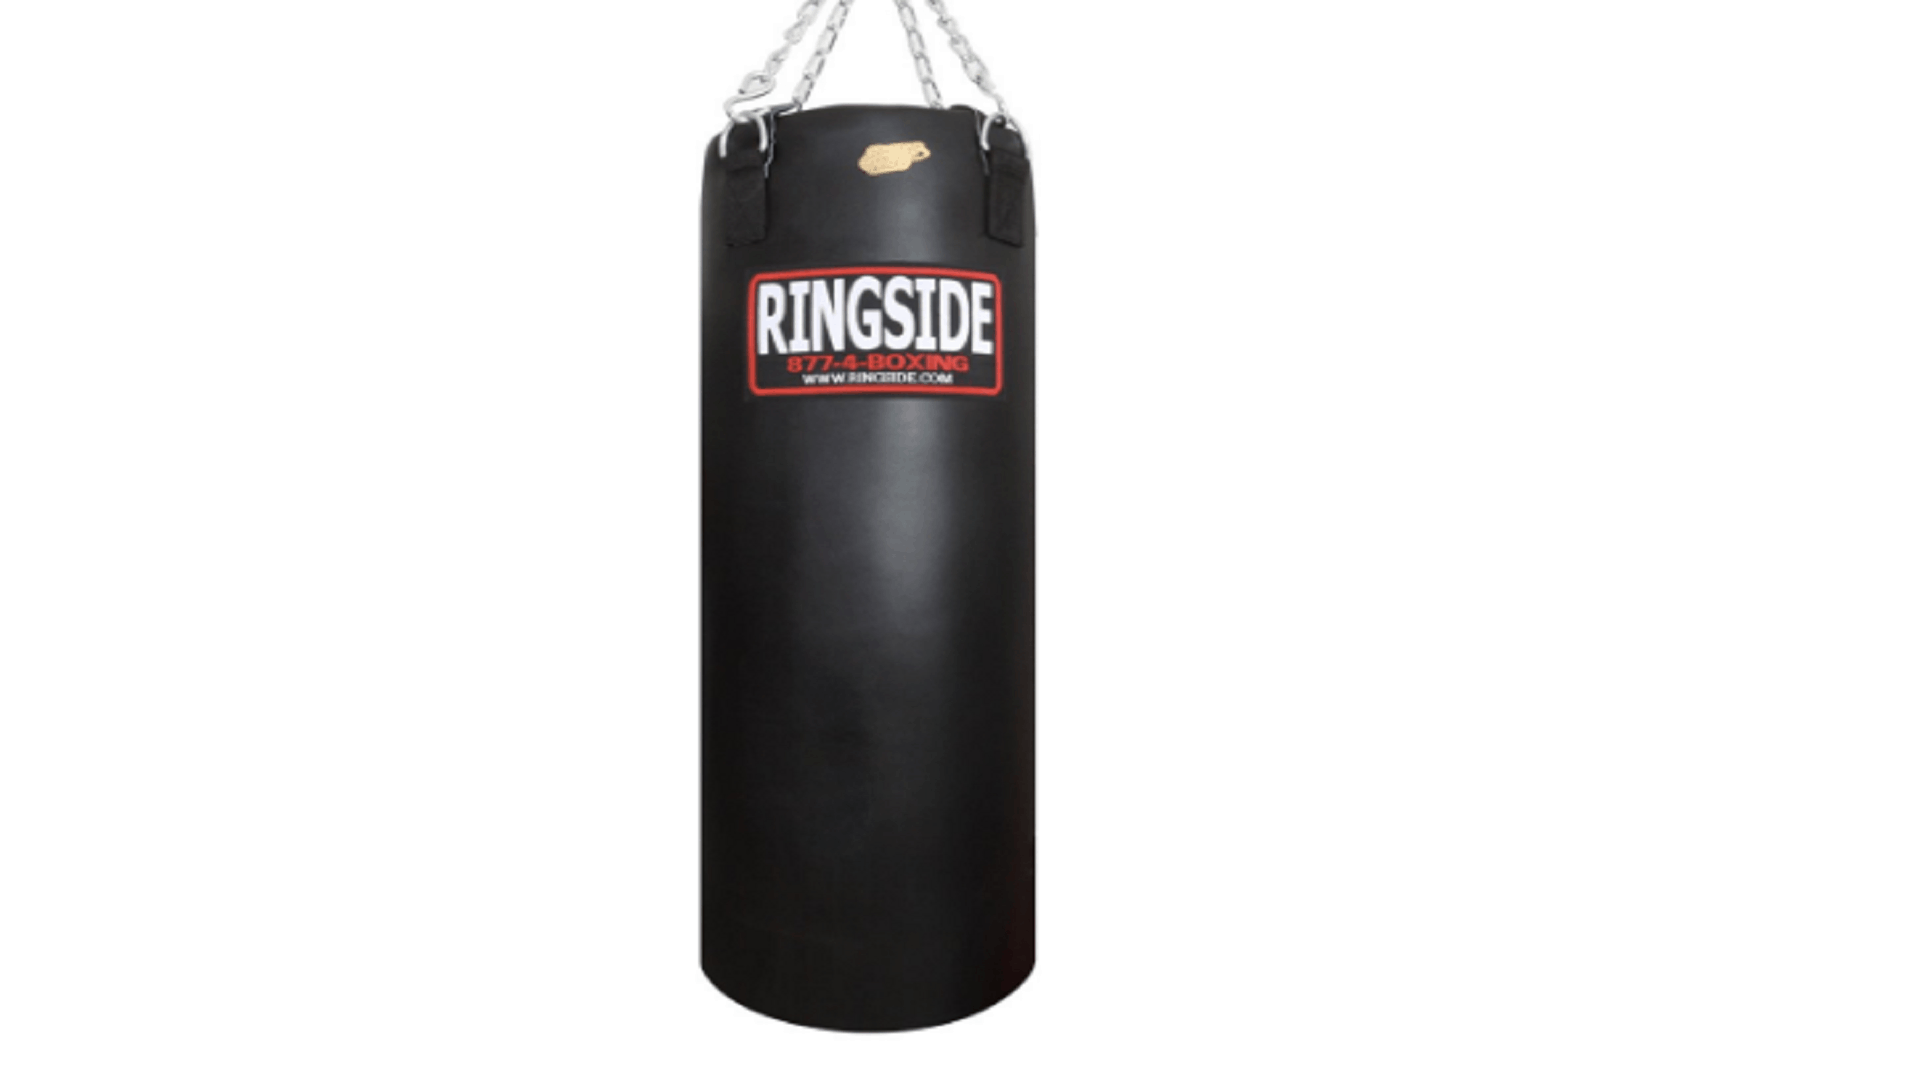 ringside 100-pound powerhide boxing